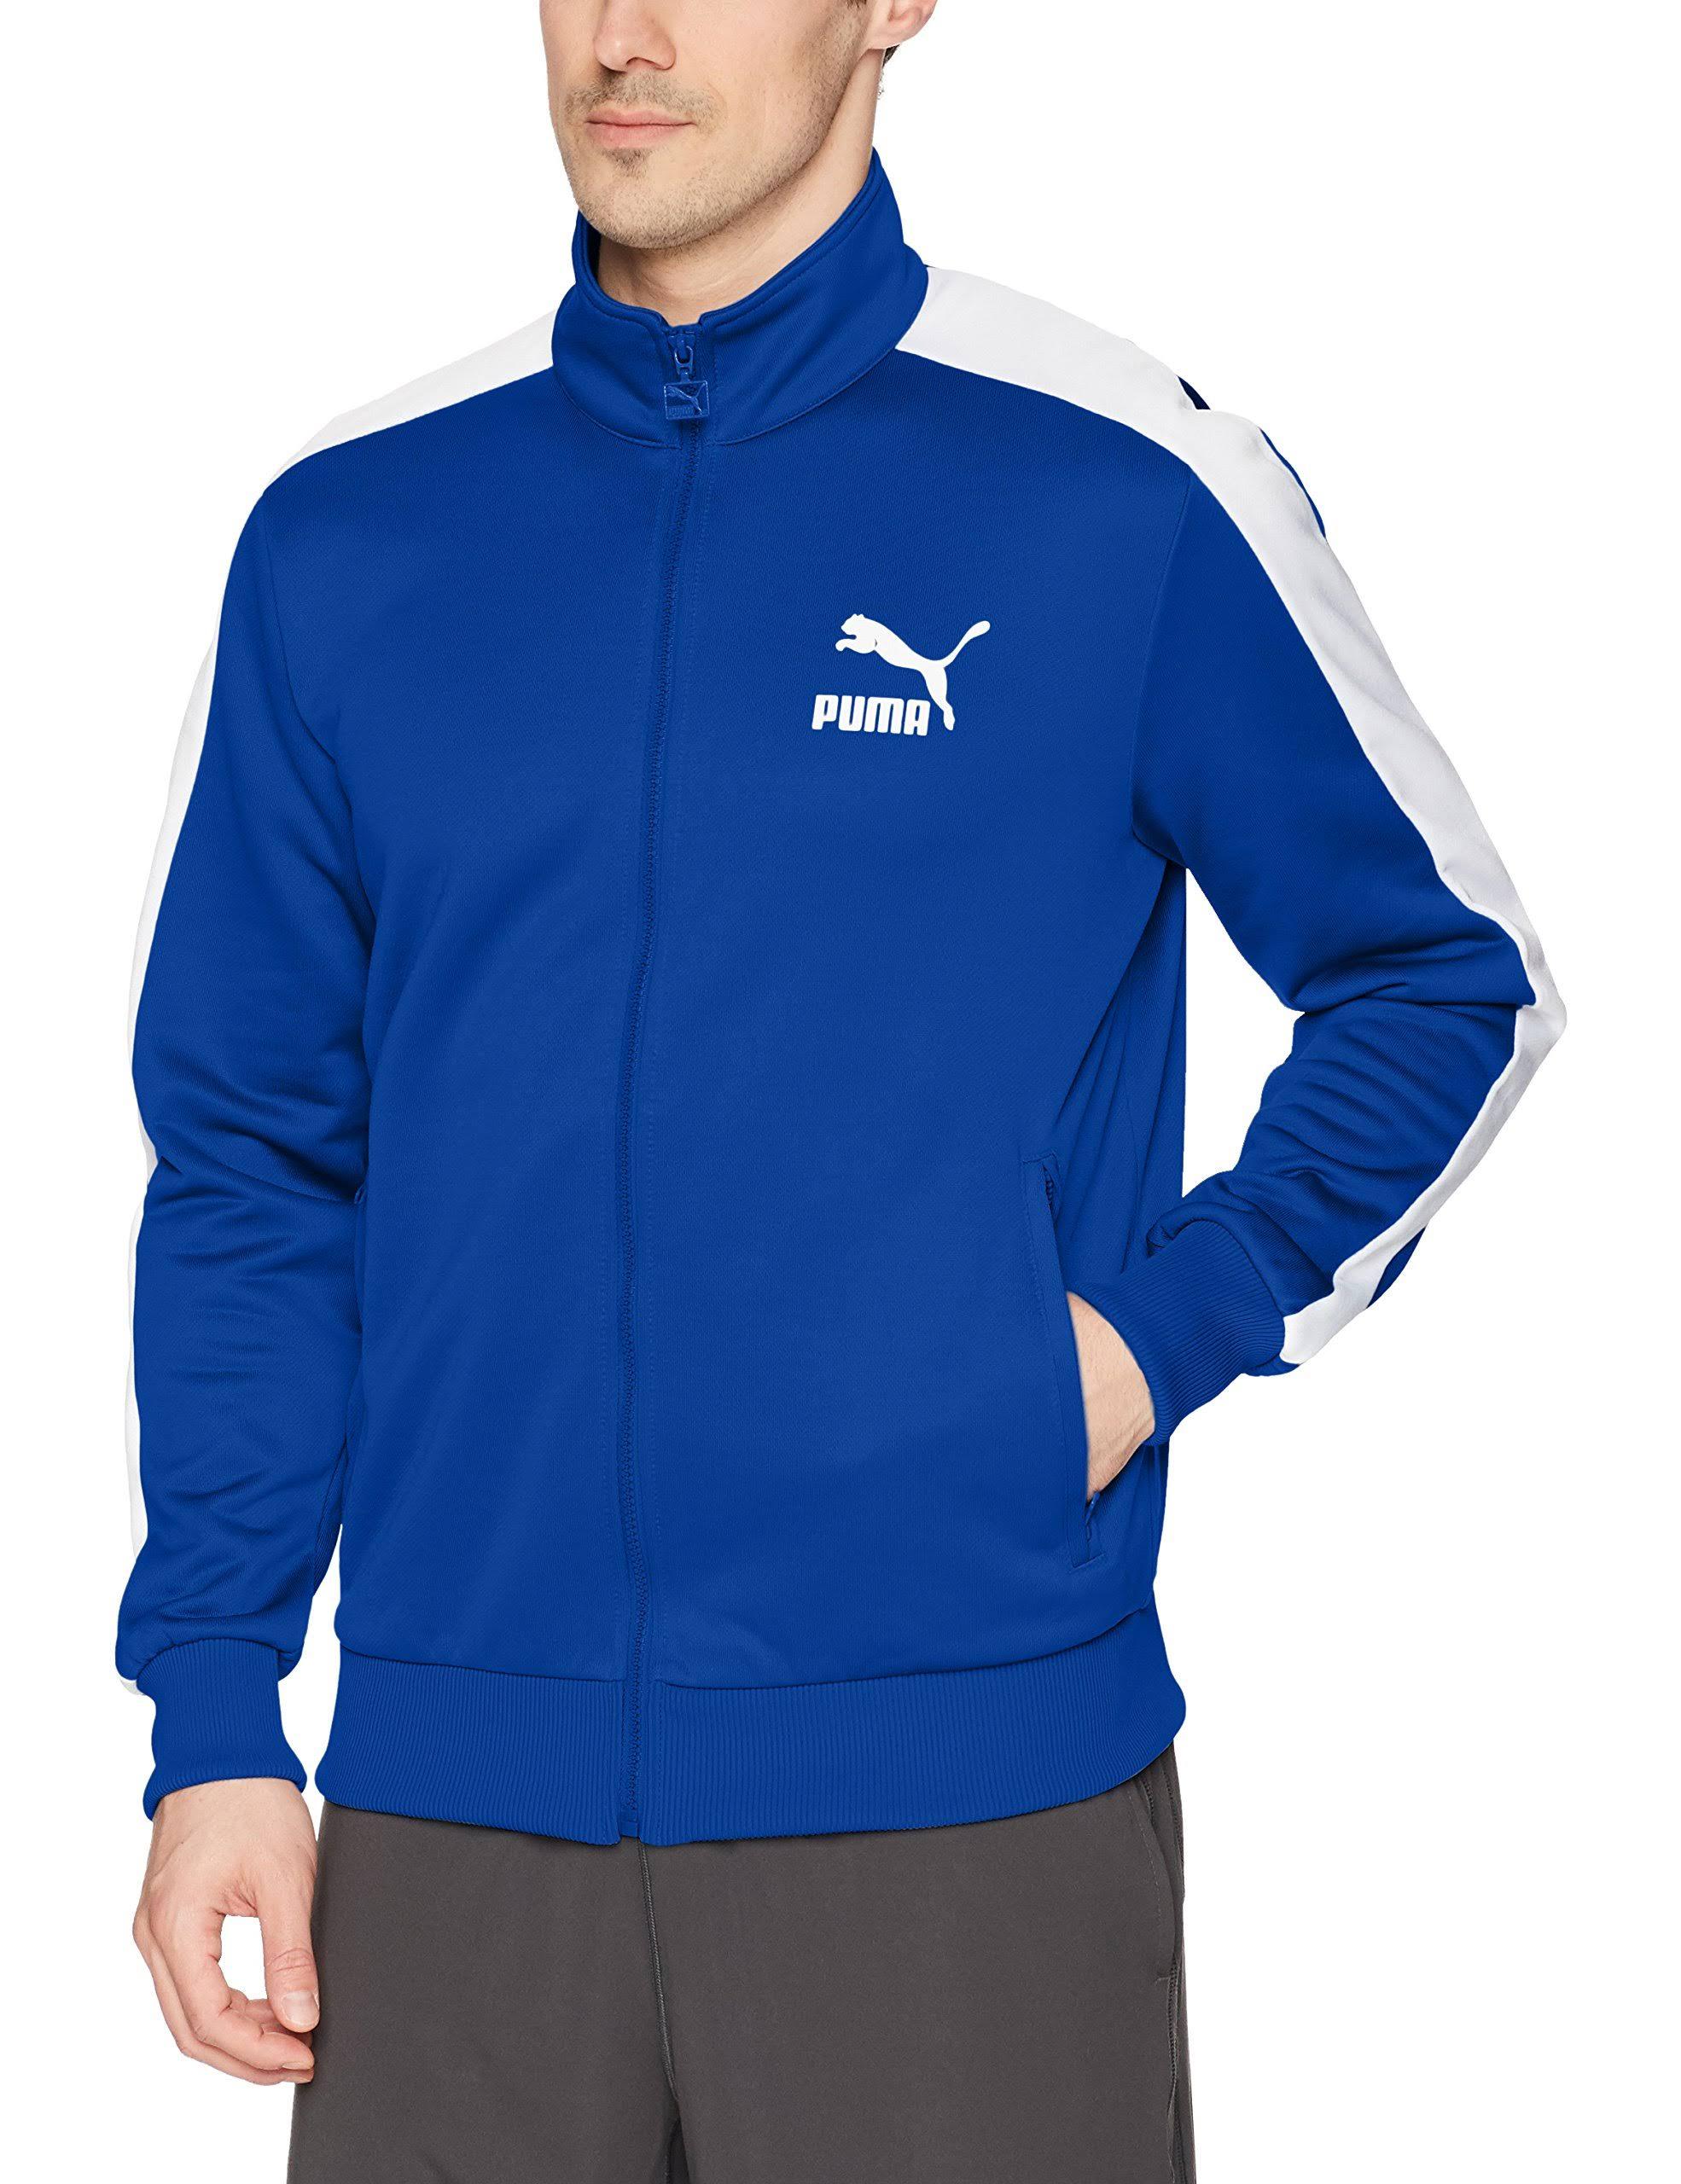 Wählen Jacket Men Archive Royal Sz Sie White Track Puma Farbe T7 dIXOqxIR